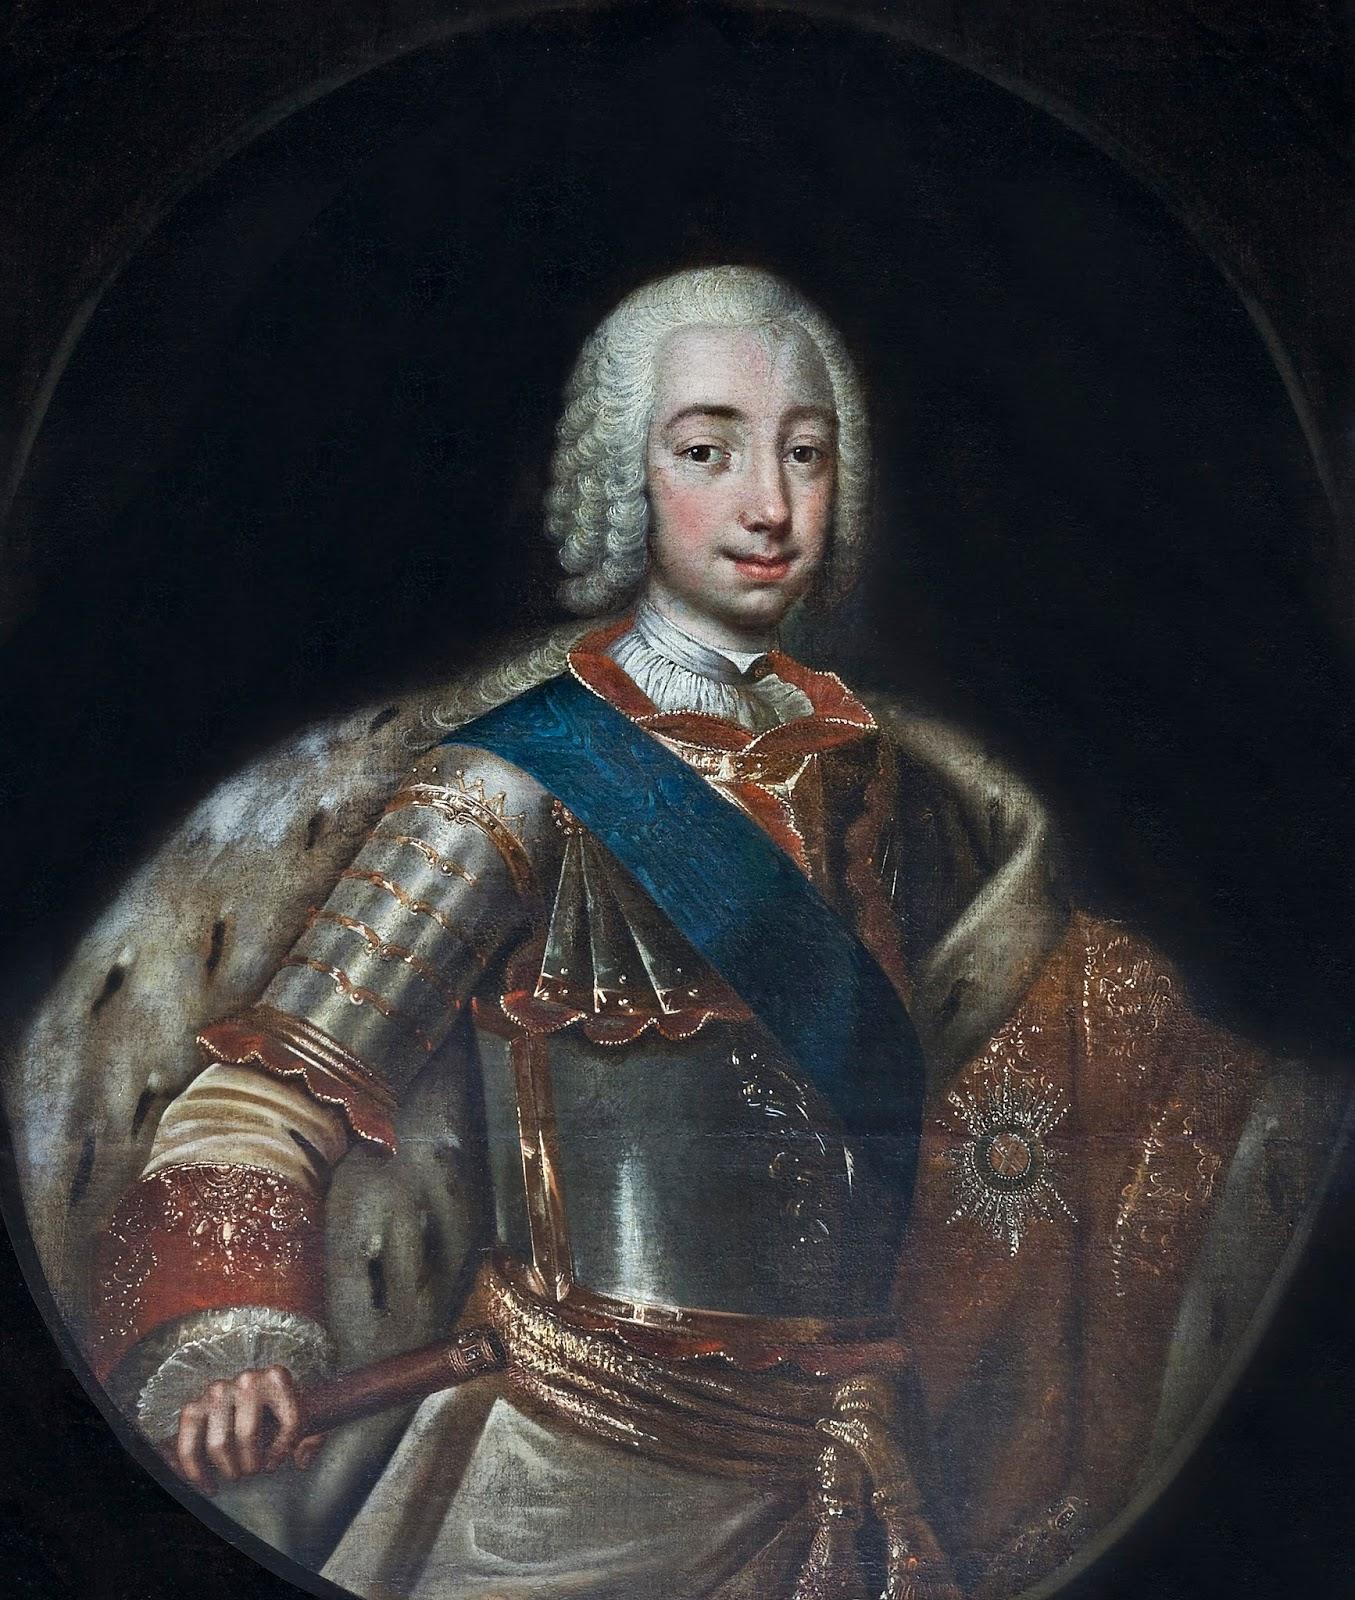 6018a2a889014 Aleksej PetrovičAntropov (San Pietroburgo1716-1795  desunto da). Ritratto  ...